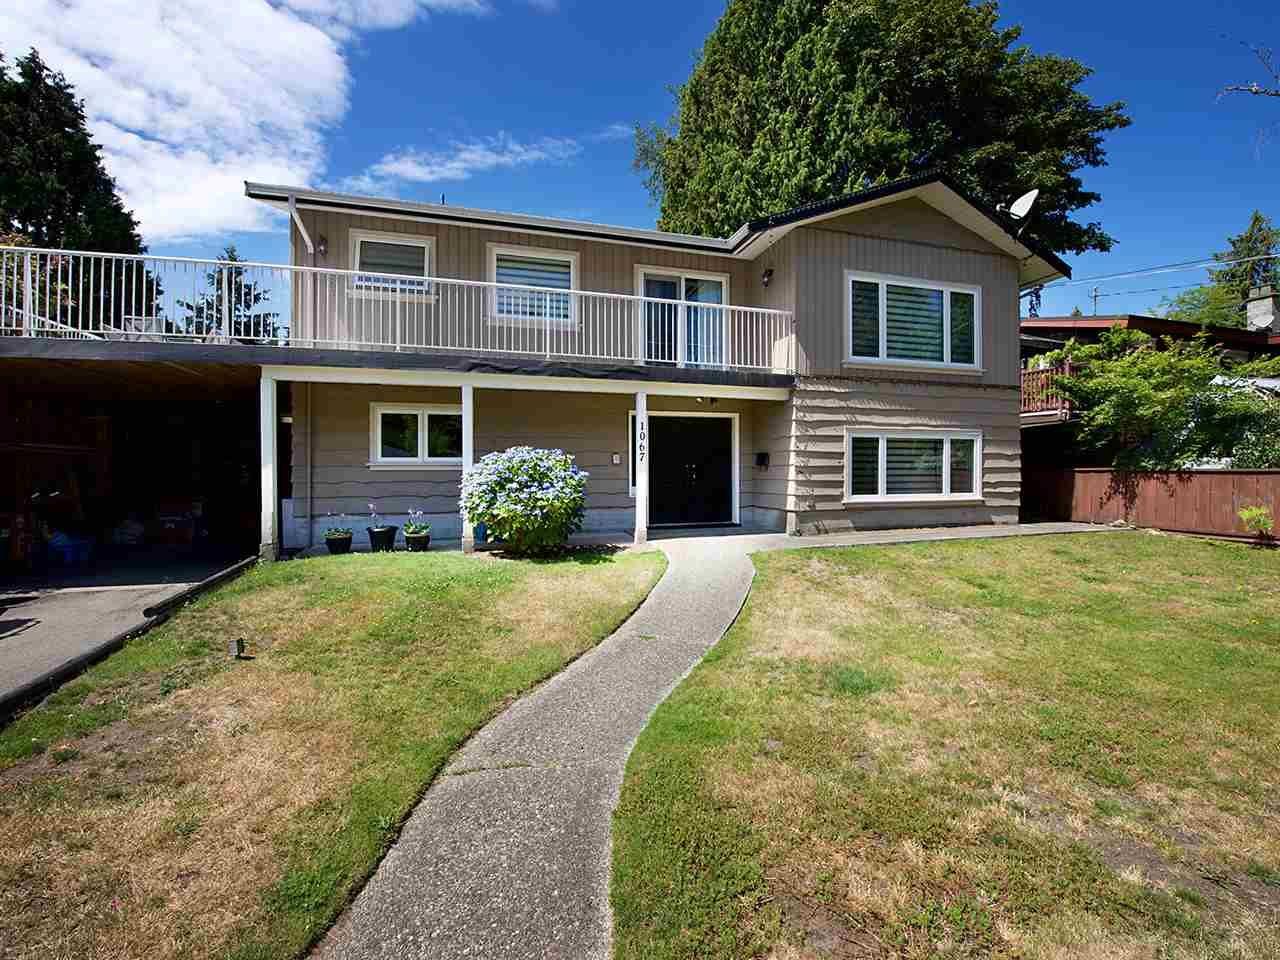 Main Photo: 1067 WILMINGTON Drive in Delta: Tsawwassen Central House for sale (Tsawwassen)  : MLS®# R2090180